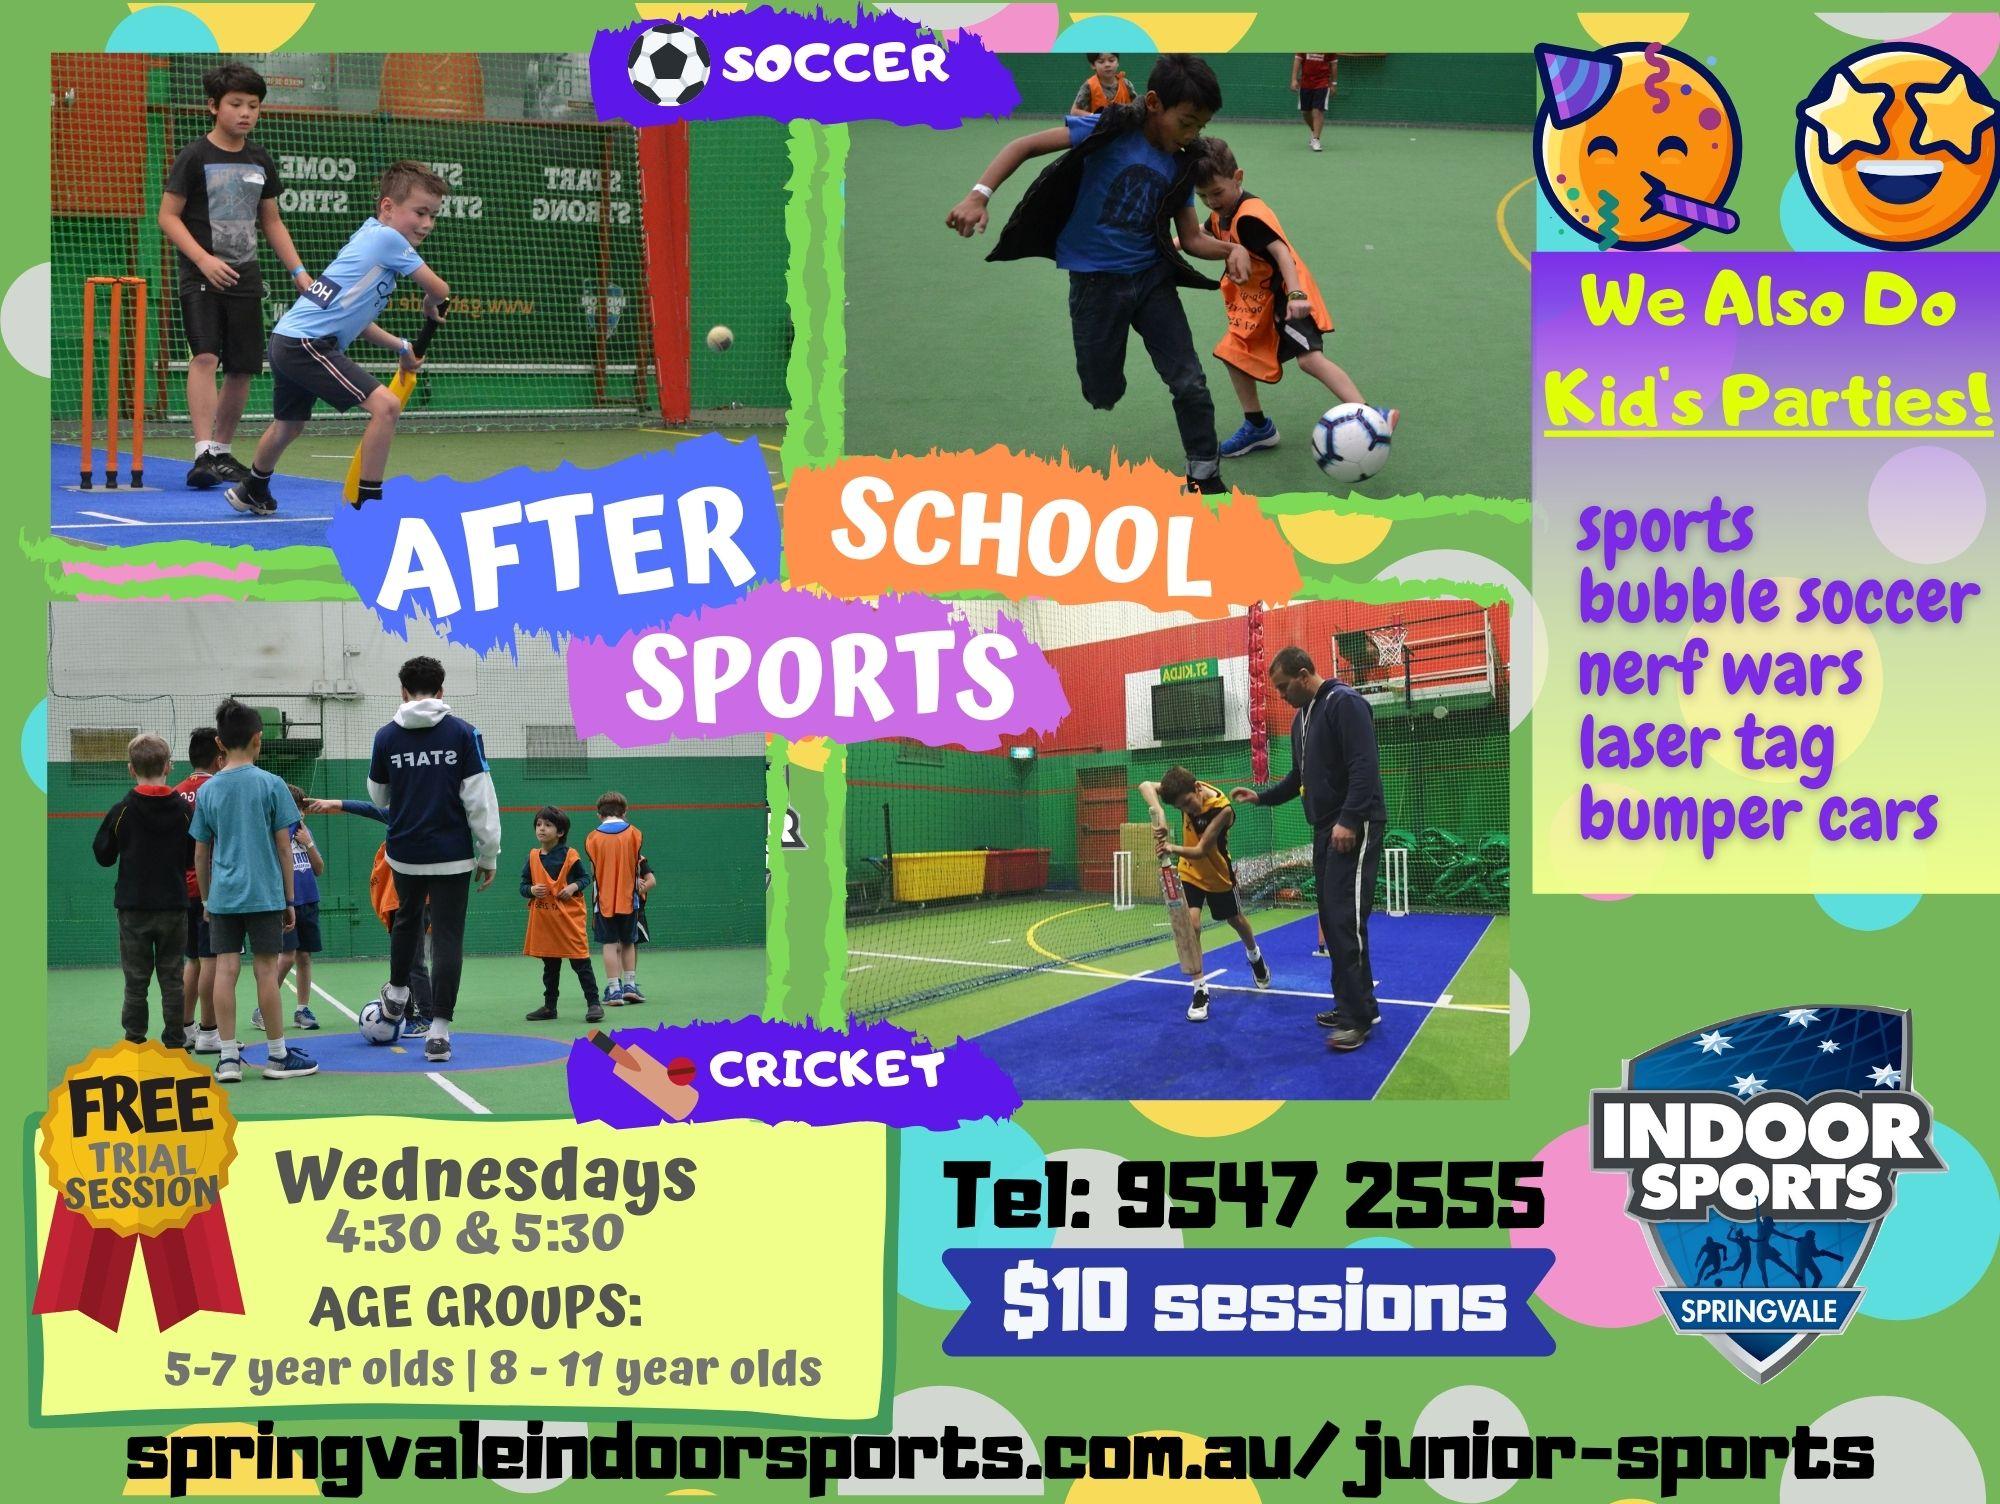 Springvale Indoor Sports